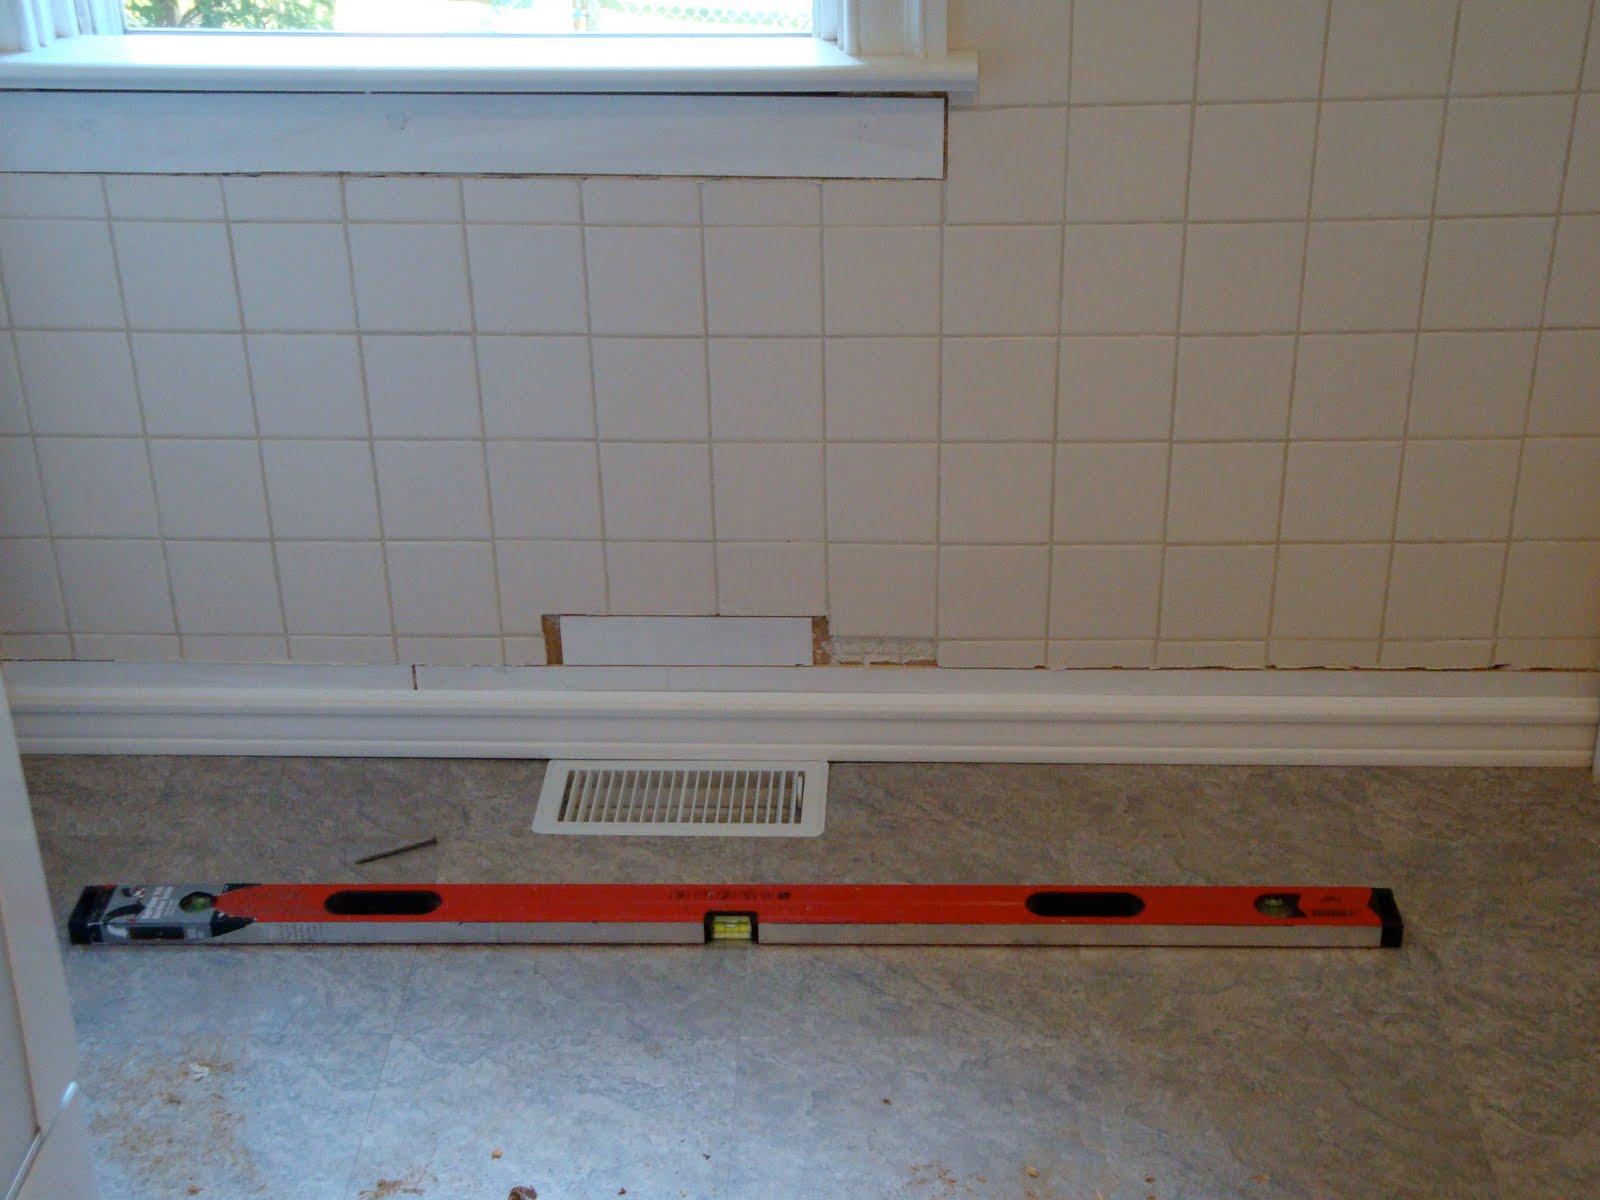 Remodelaholic kitchen backsplash tiles now beadboard kitchen backsplash tiles now beadboard dailygadgetfo Choice Image